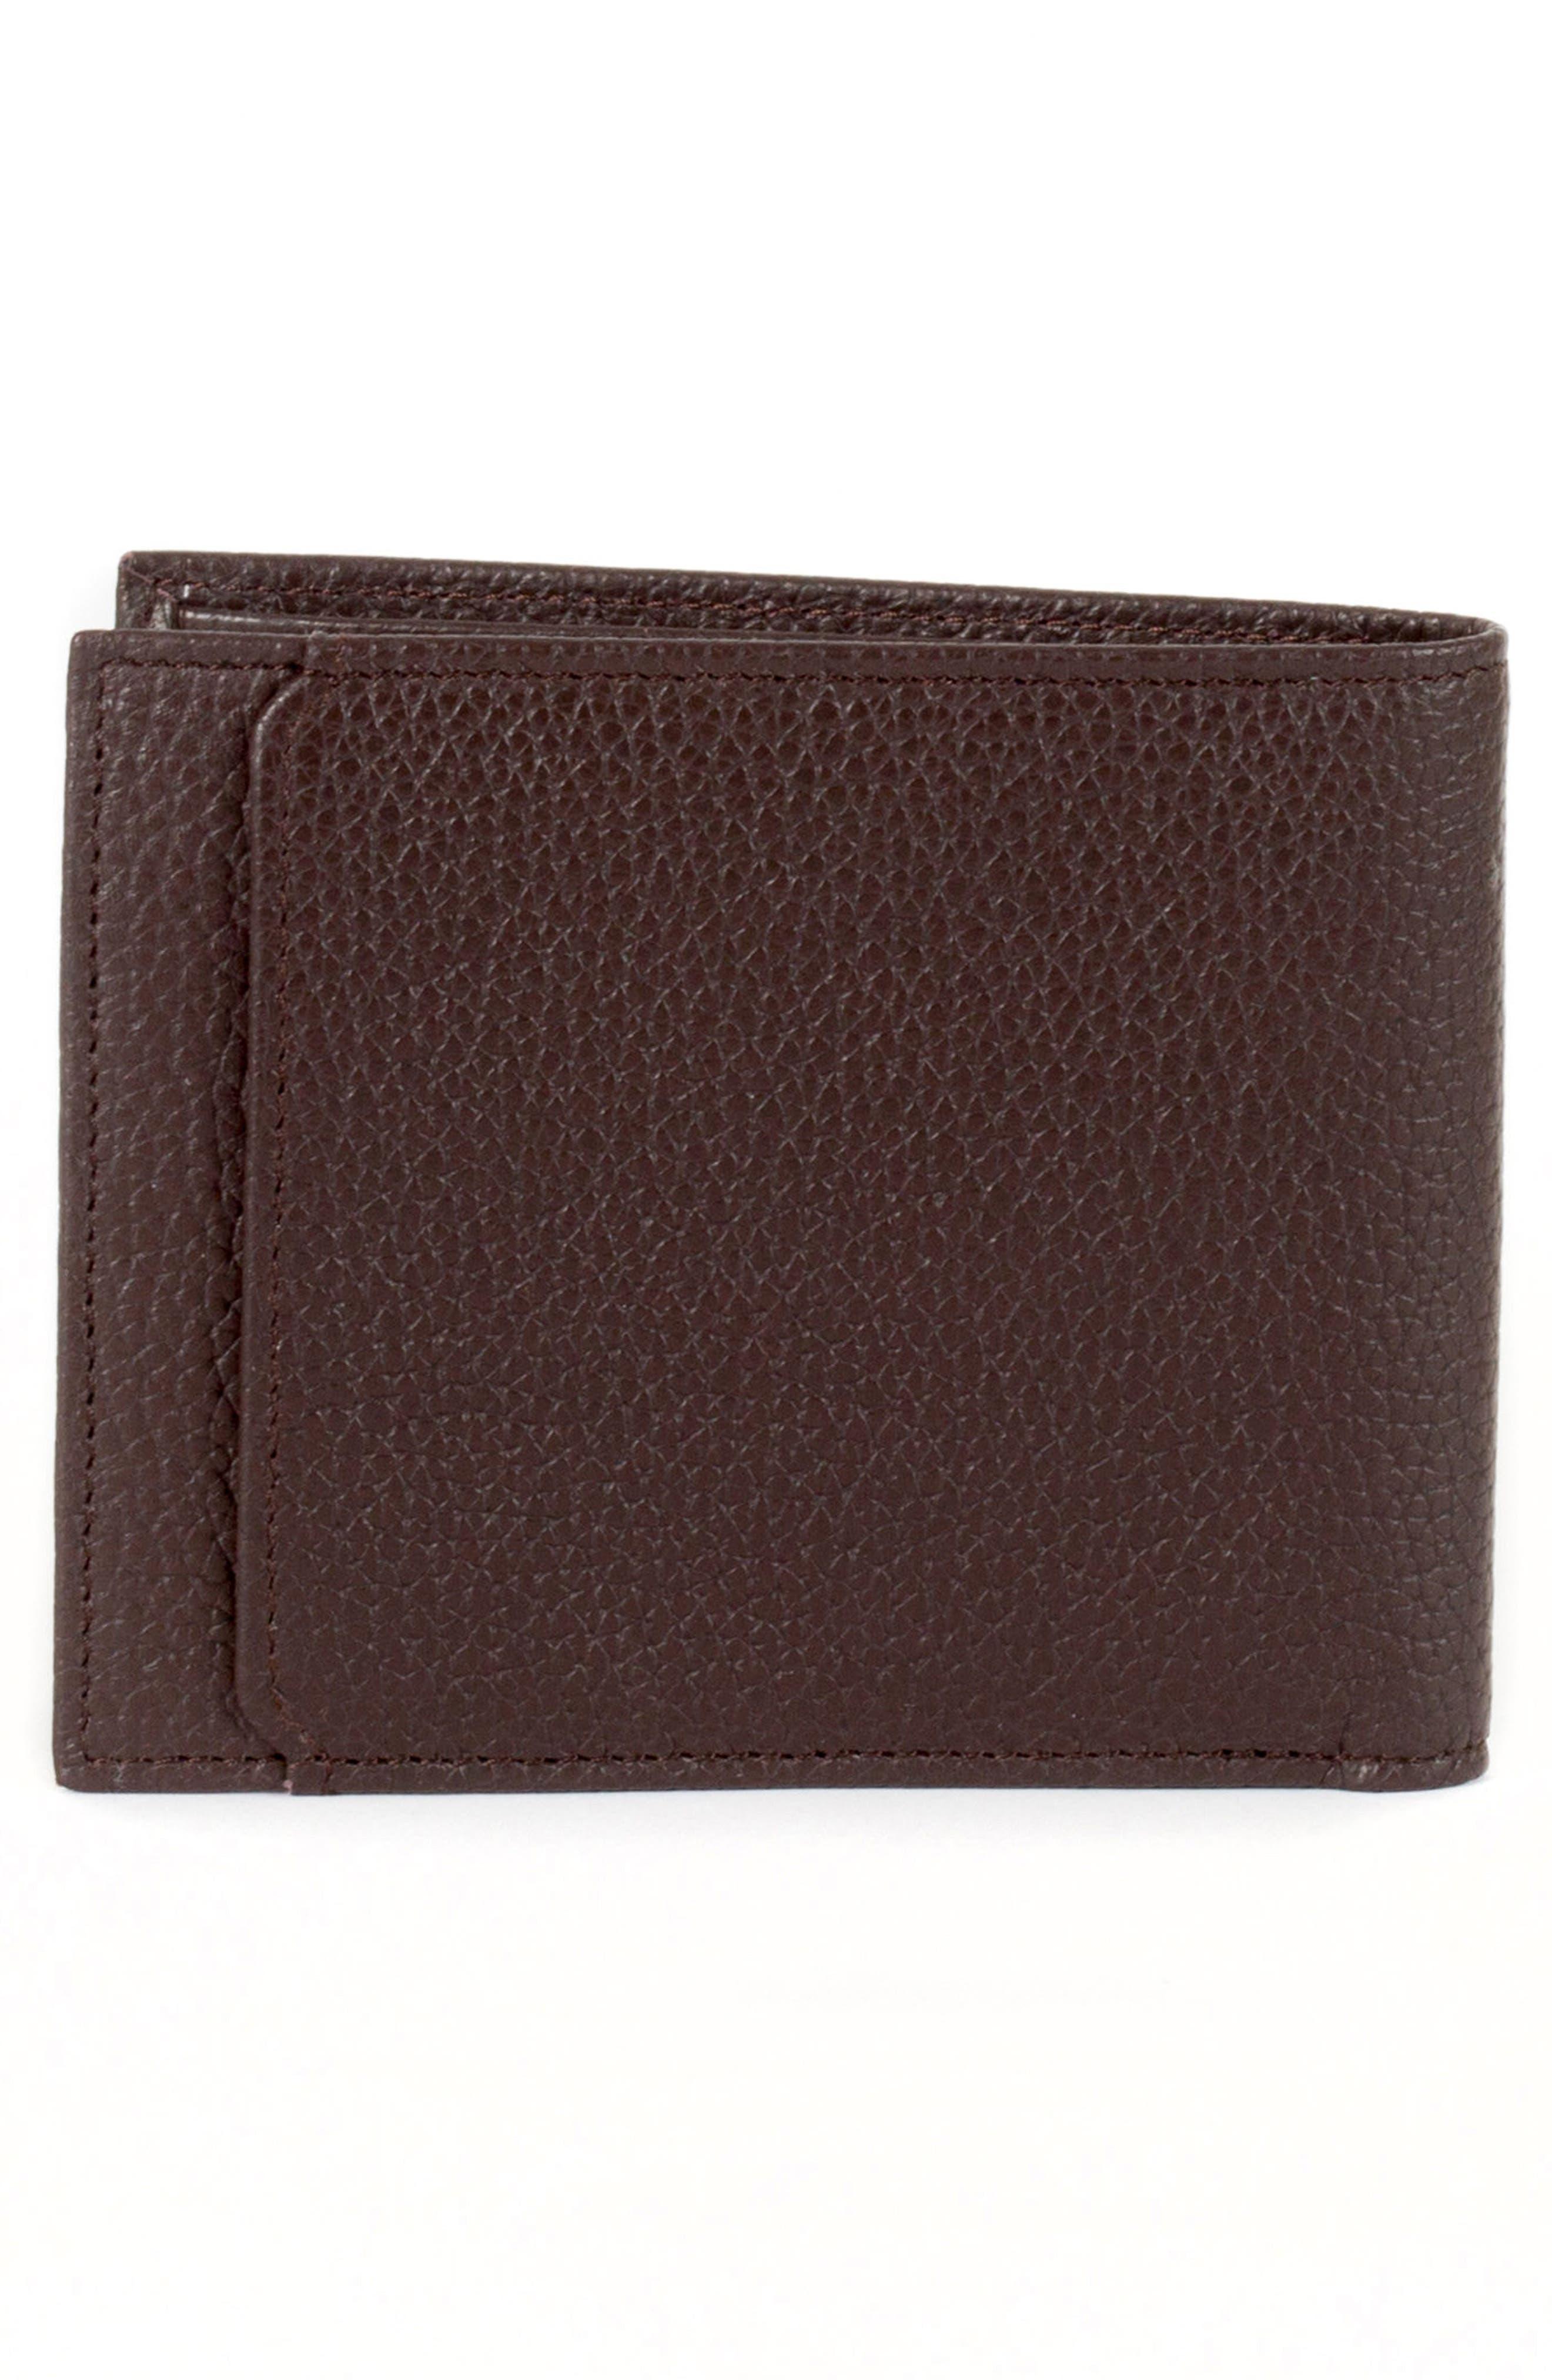 Garth Leather Bifold Wallet,                             Alternate thumbnail 3, color,                             Brown/ Tan/ Purple